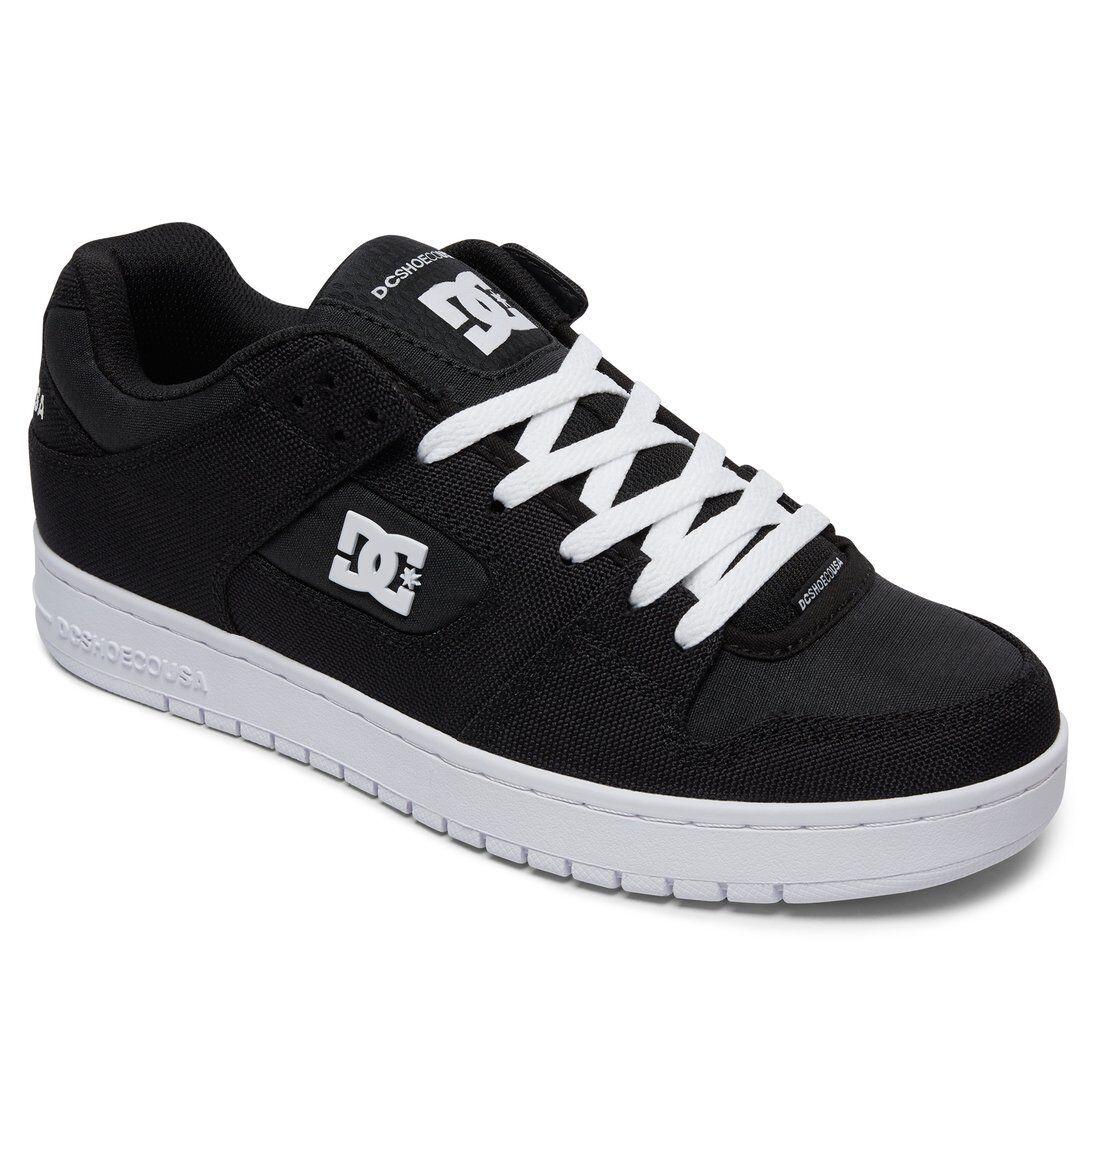 hommes DC MANTECA TX SE SKATEBOARDING Chaussures NIB noir blanc (BKW)